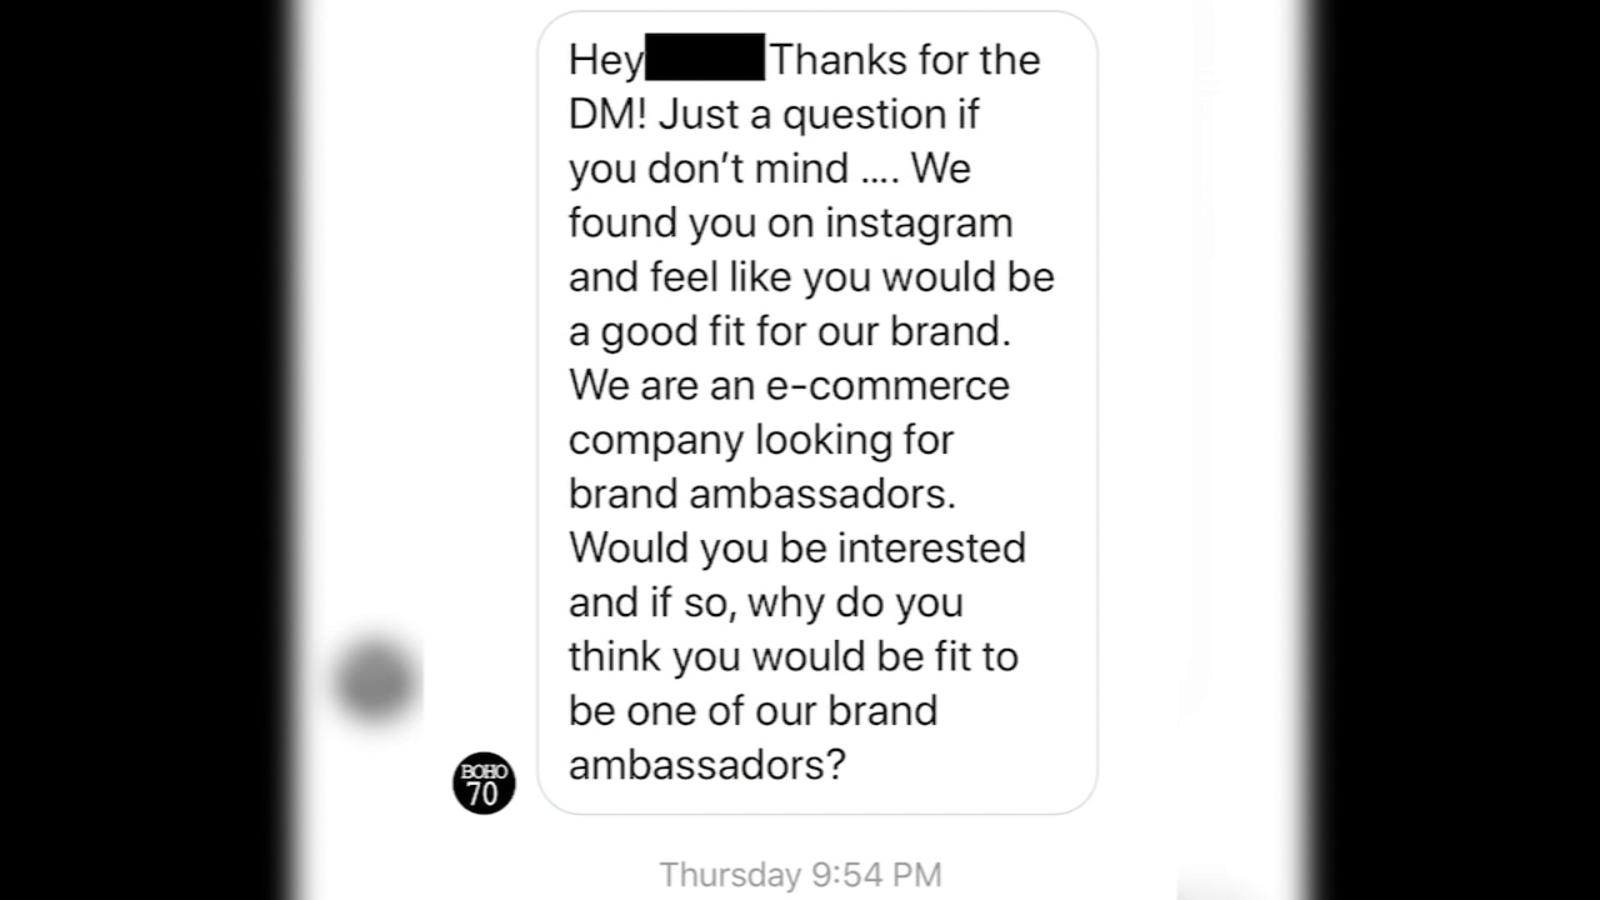 Social media users falling for fake brand ambassador offers